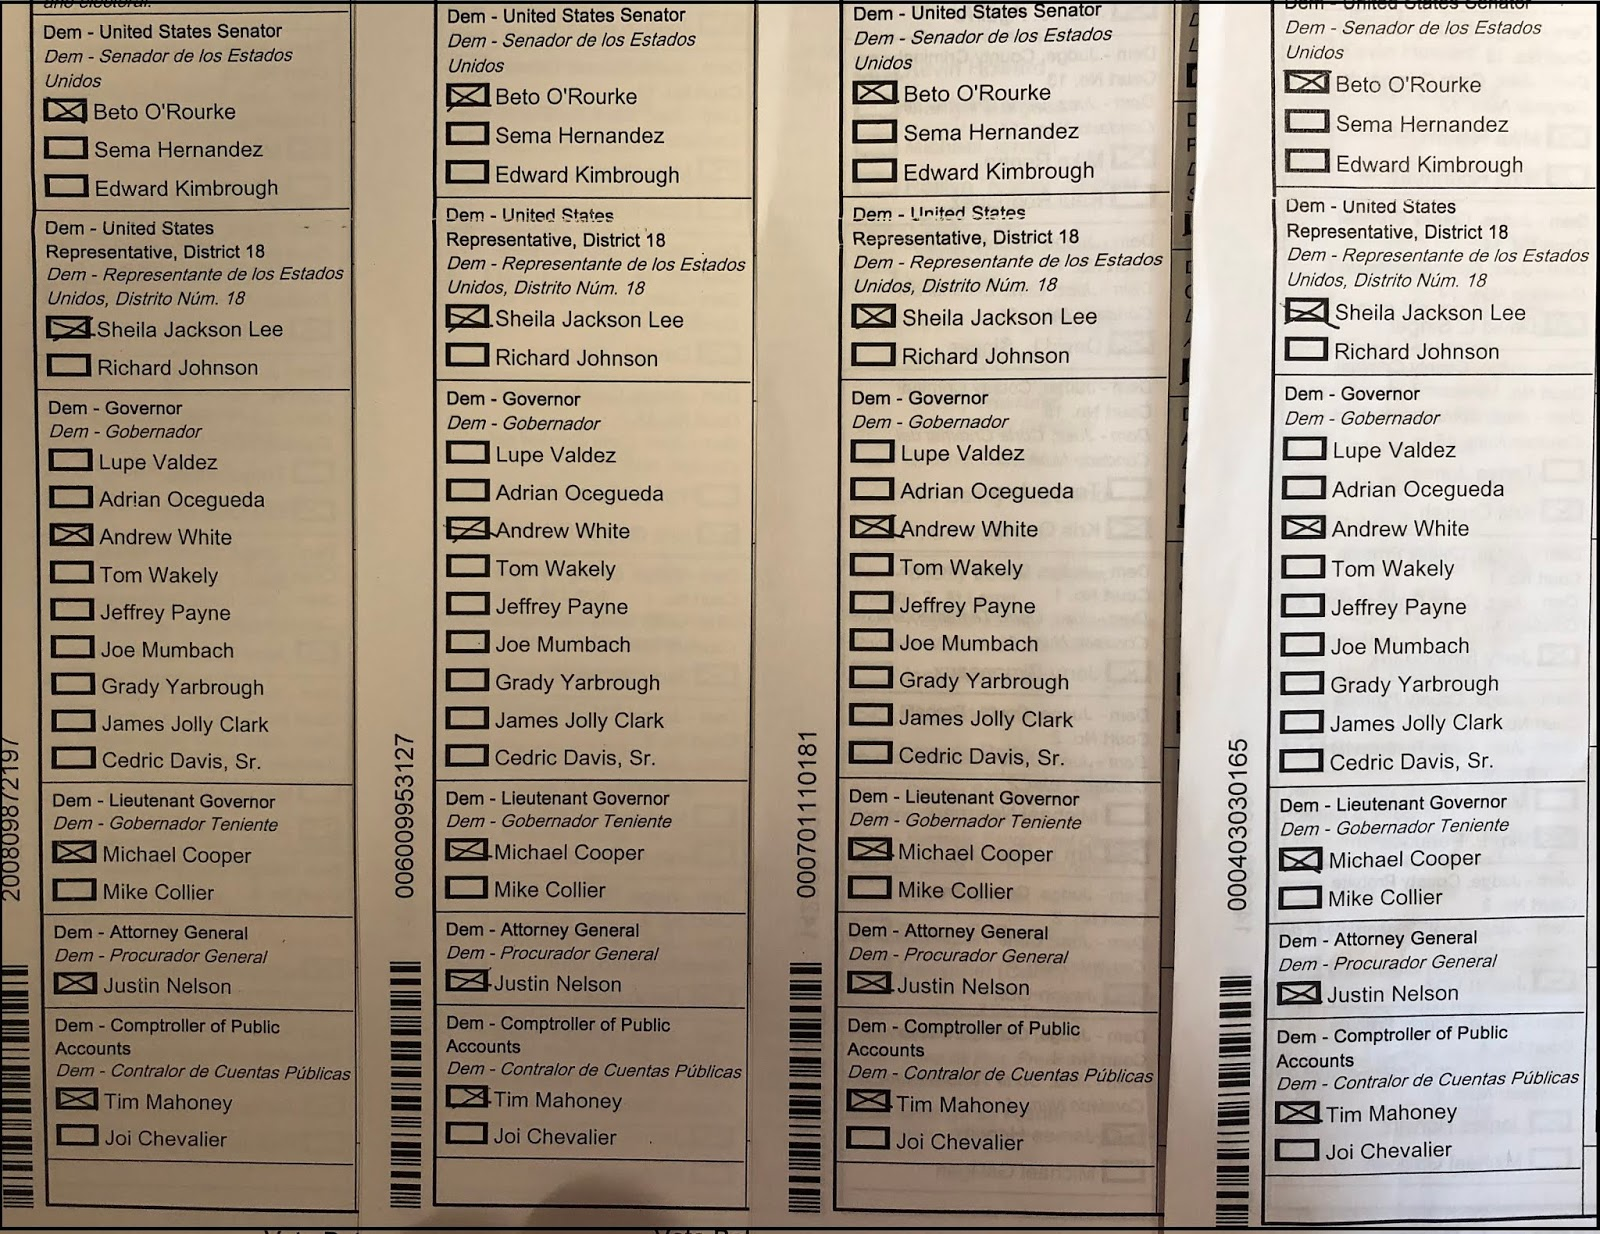 Allen West Condemns Democrats After National File's Biden-Sheila Jackson Lee Voter Fraud Report 11